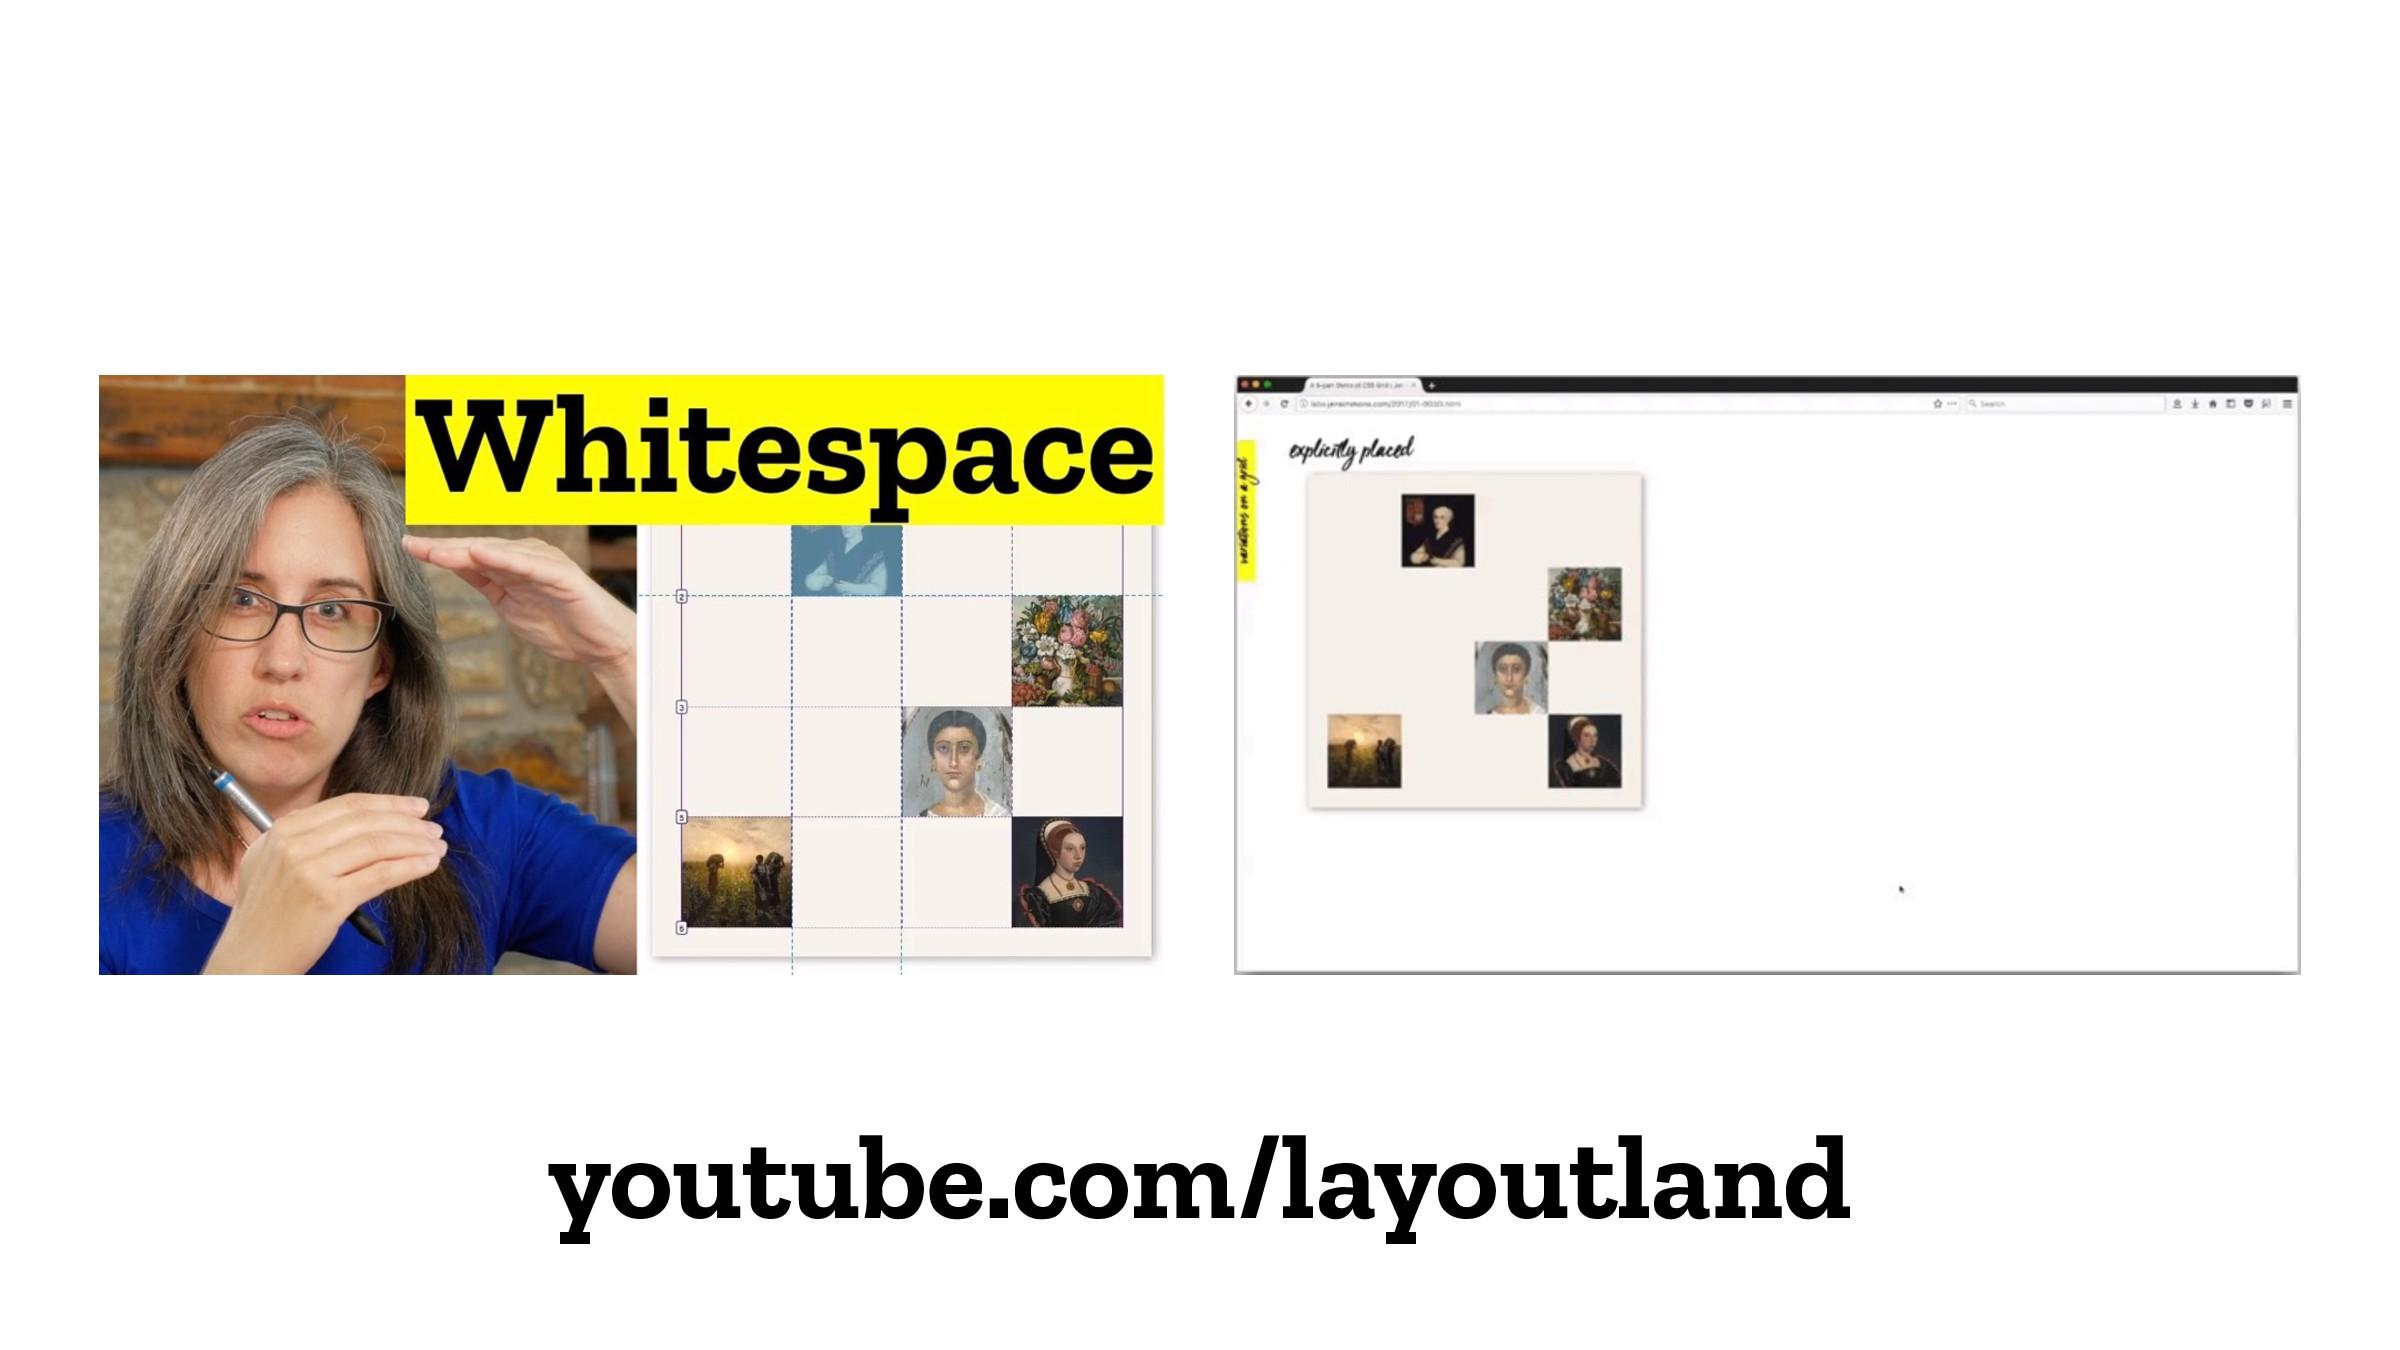 youtube.com/layoutland